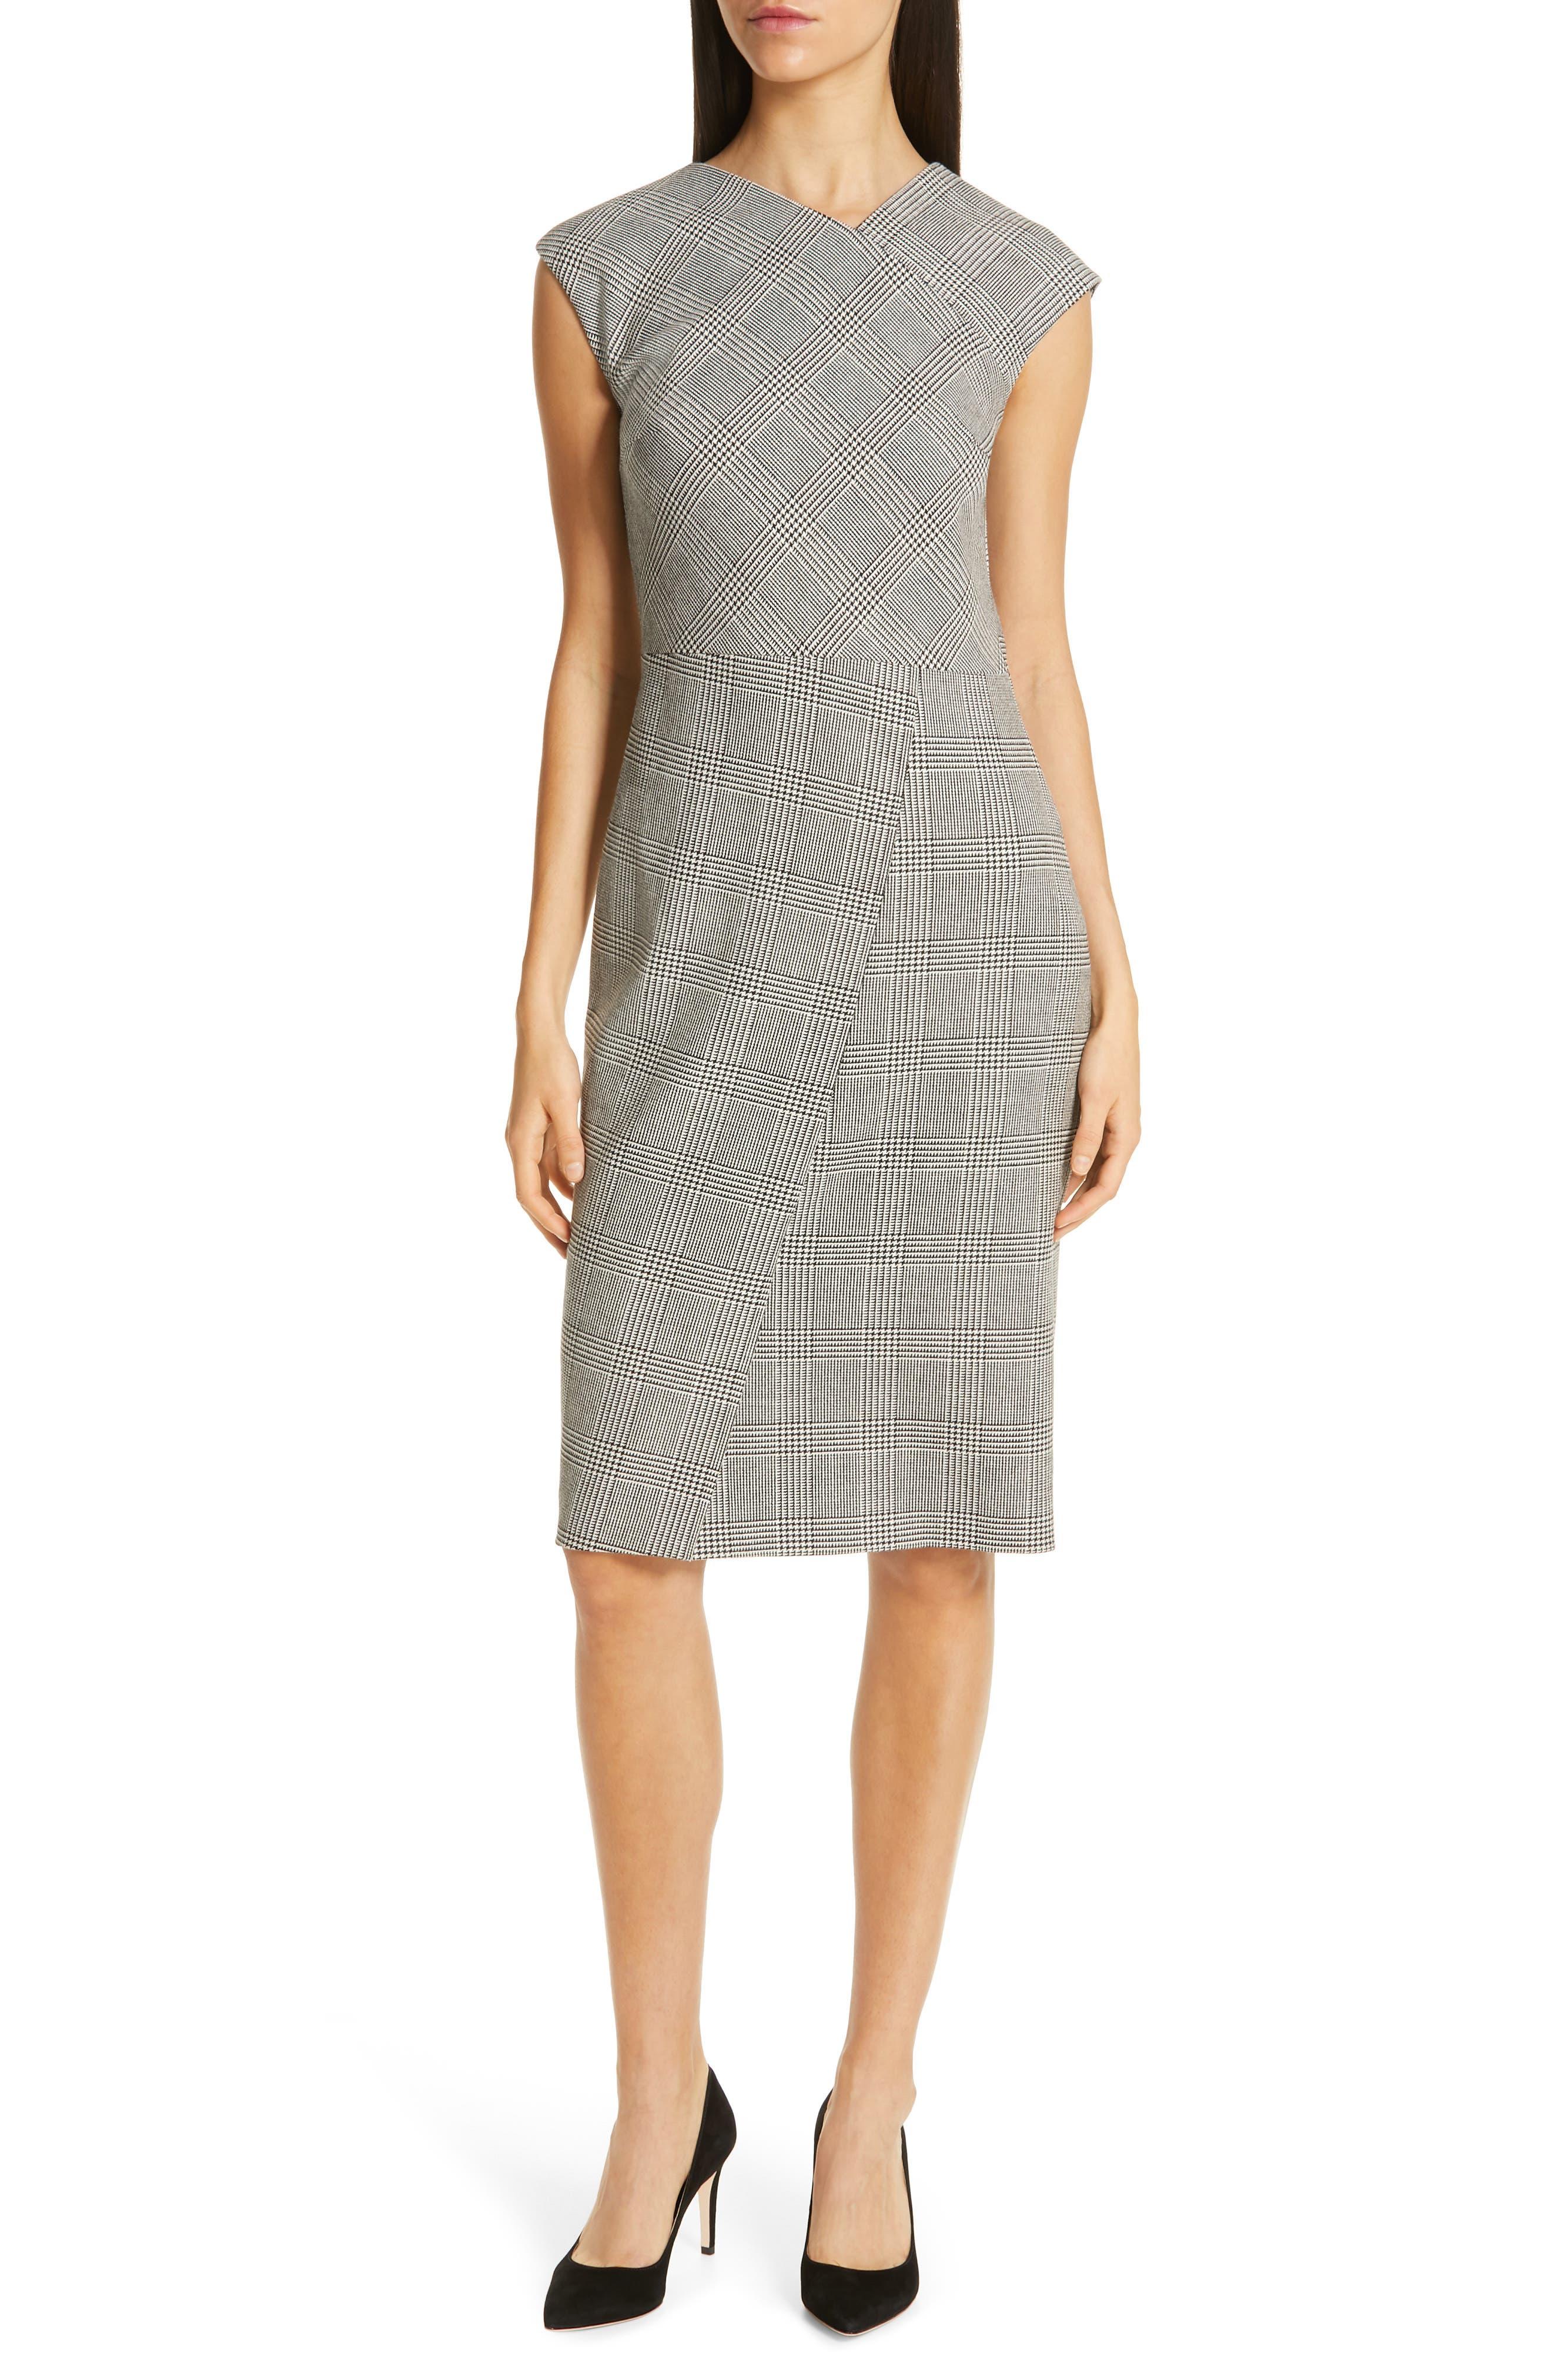 BOSS Dechesta Glen Plaid Sheath Dress, Main, color, 020